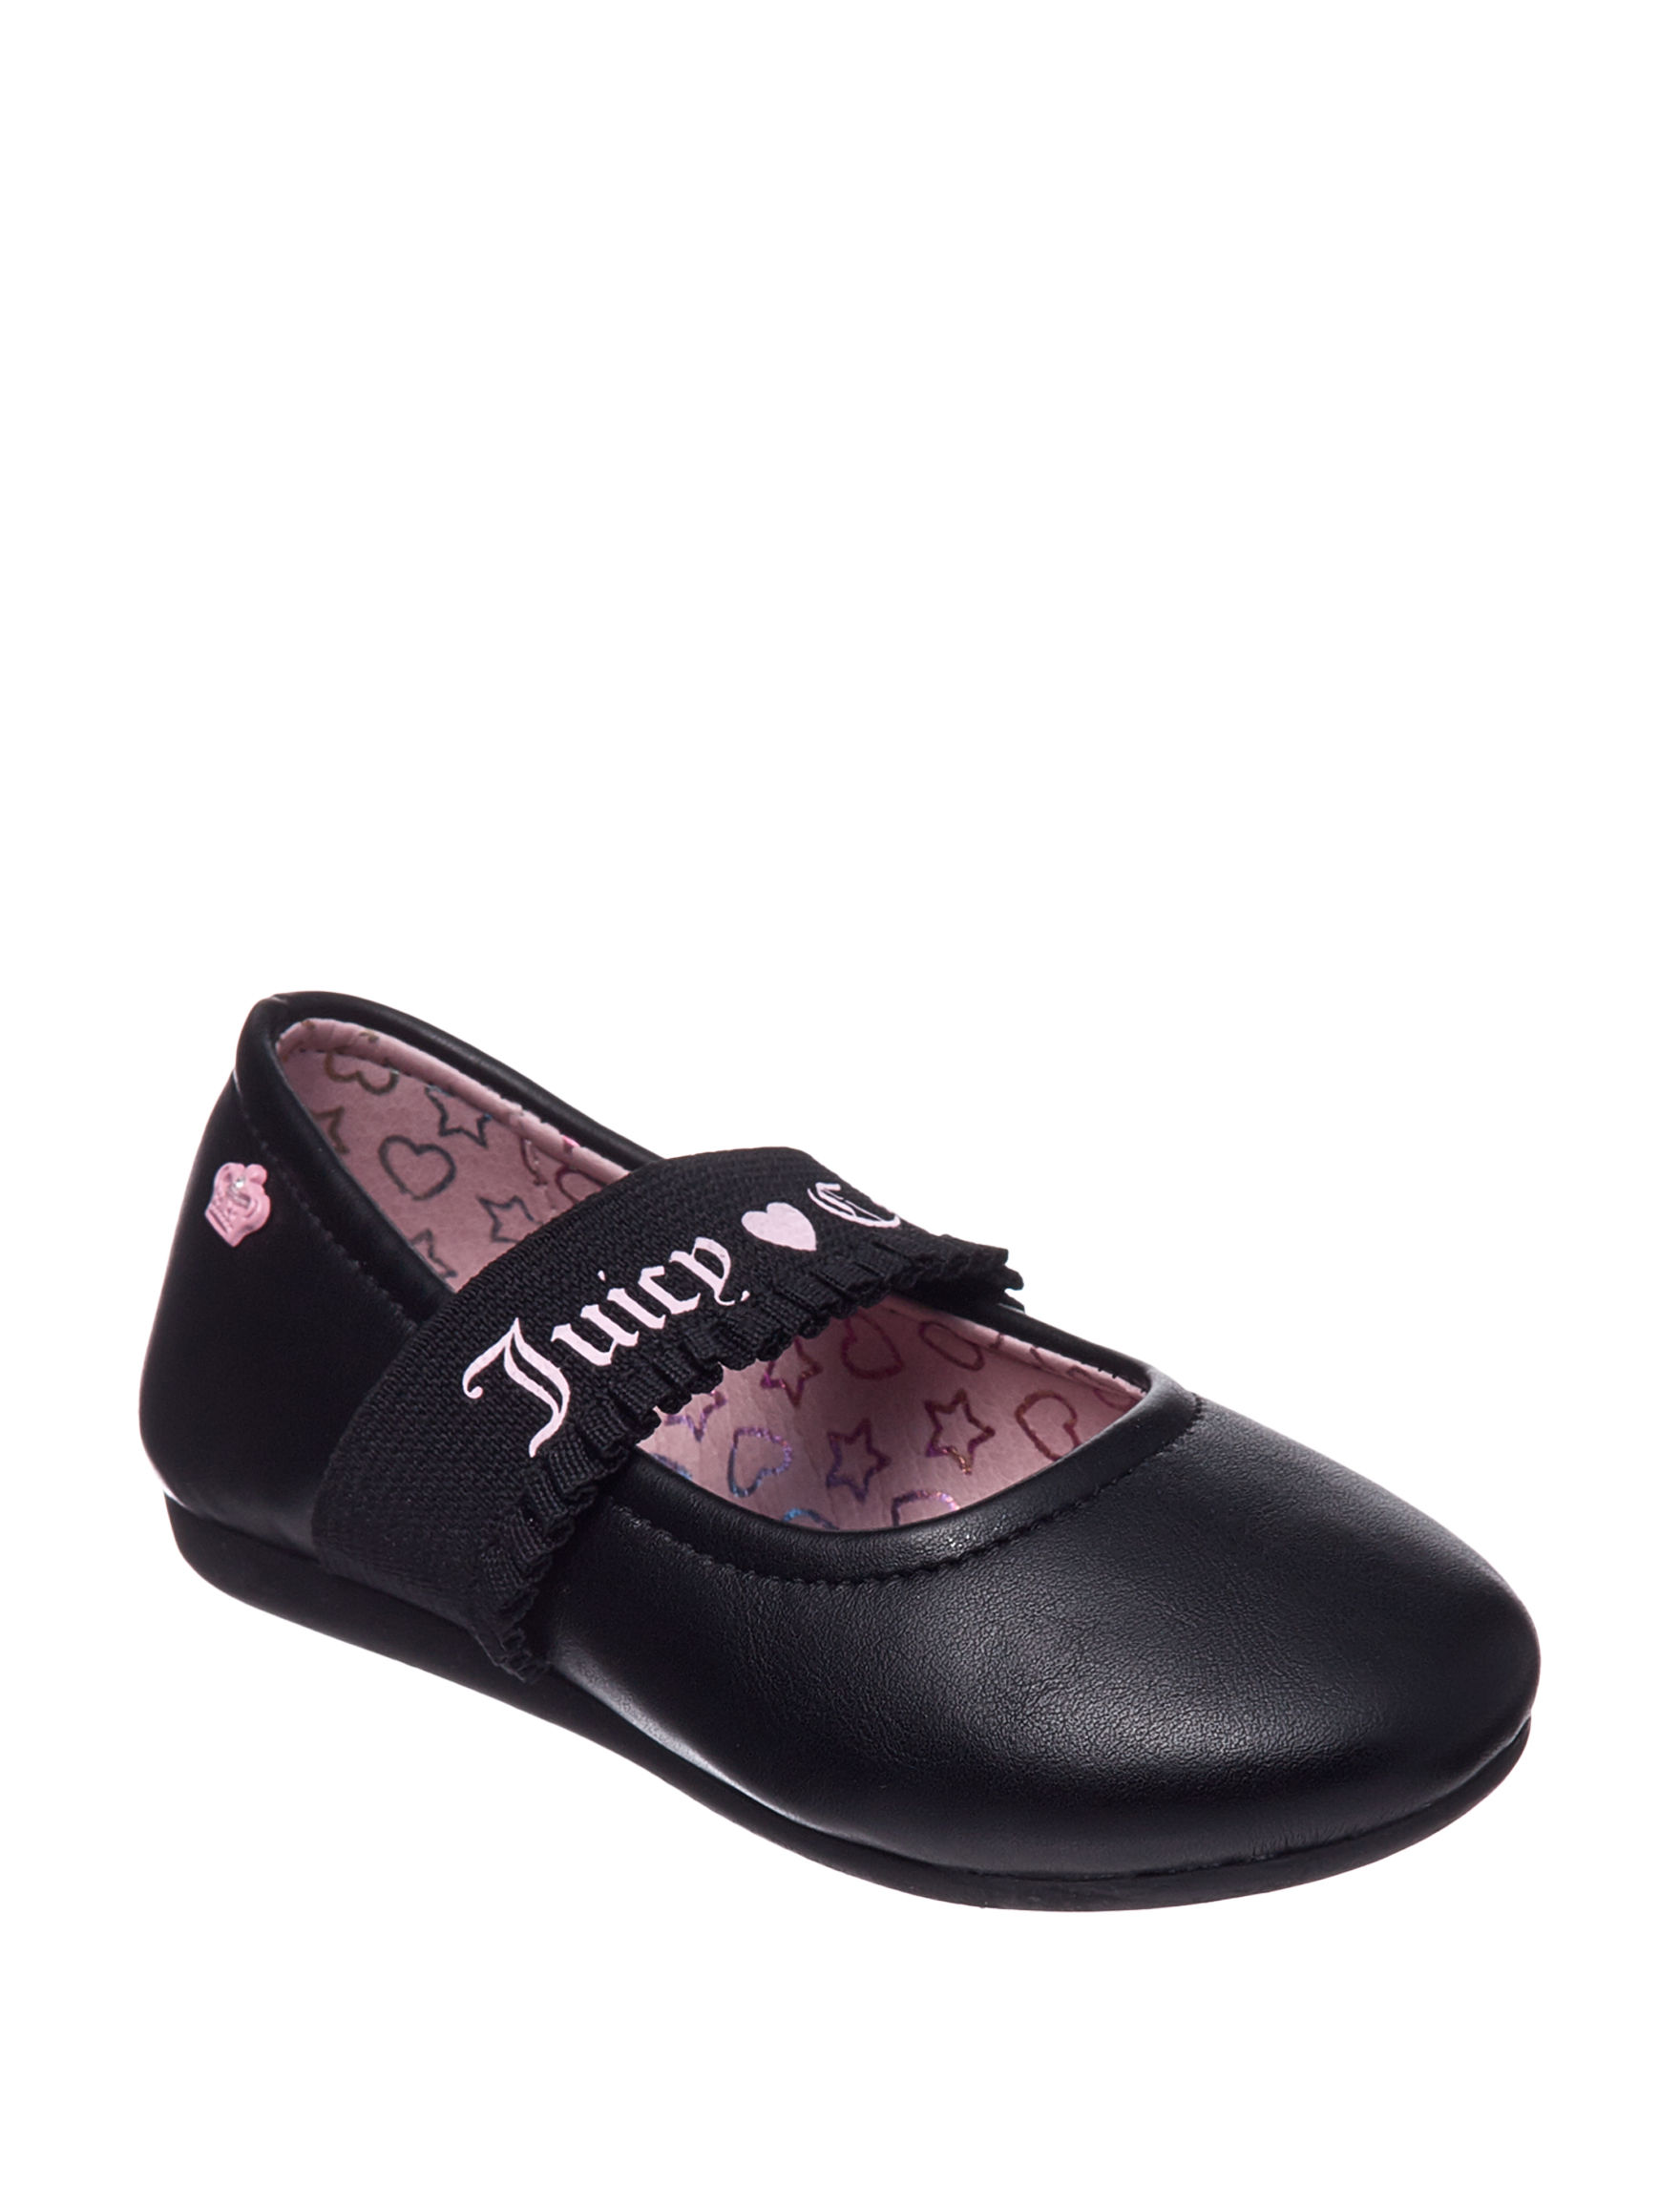 Juicy Couture Black / Pink